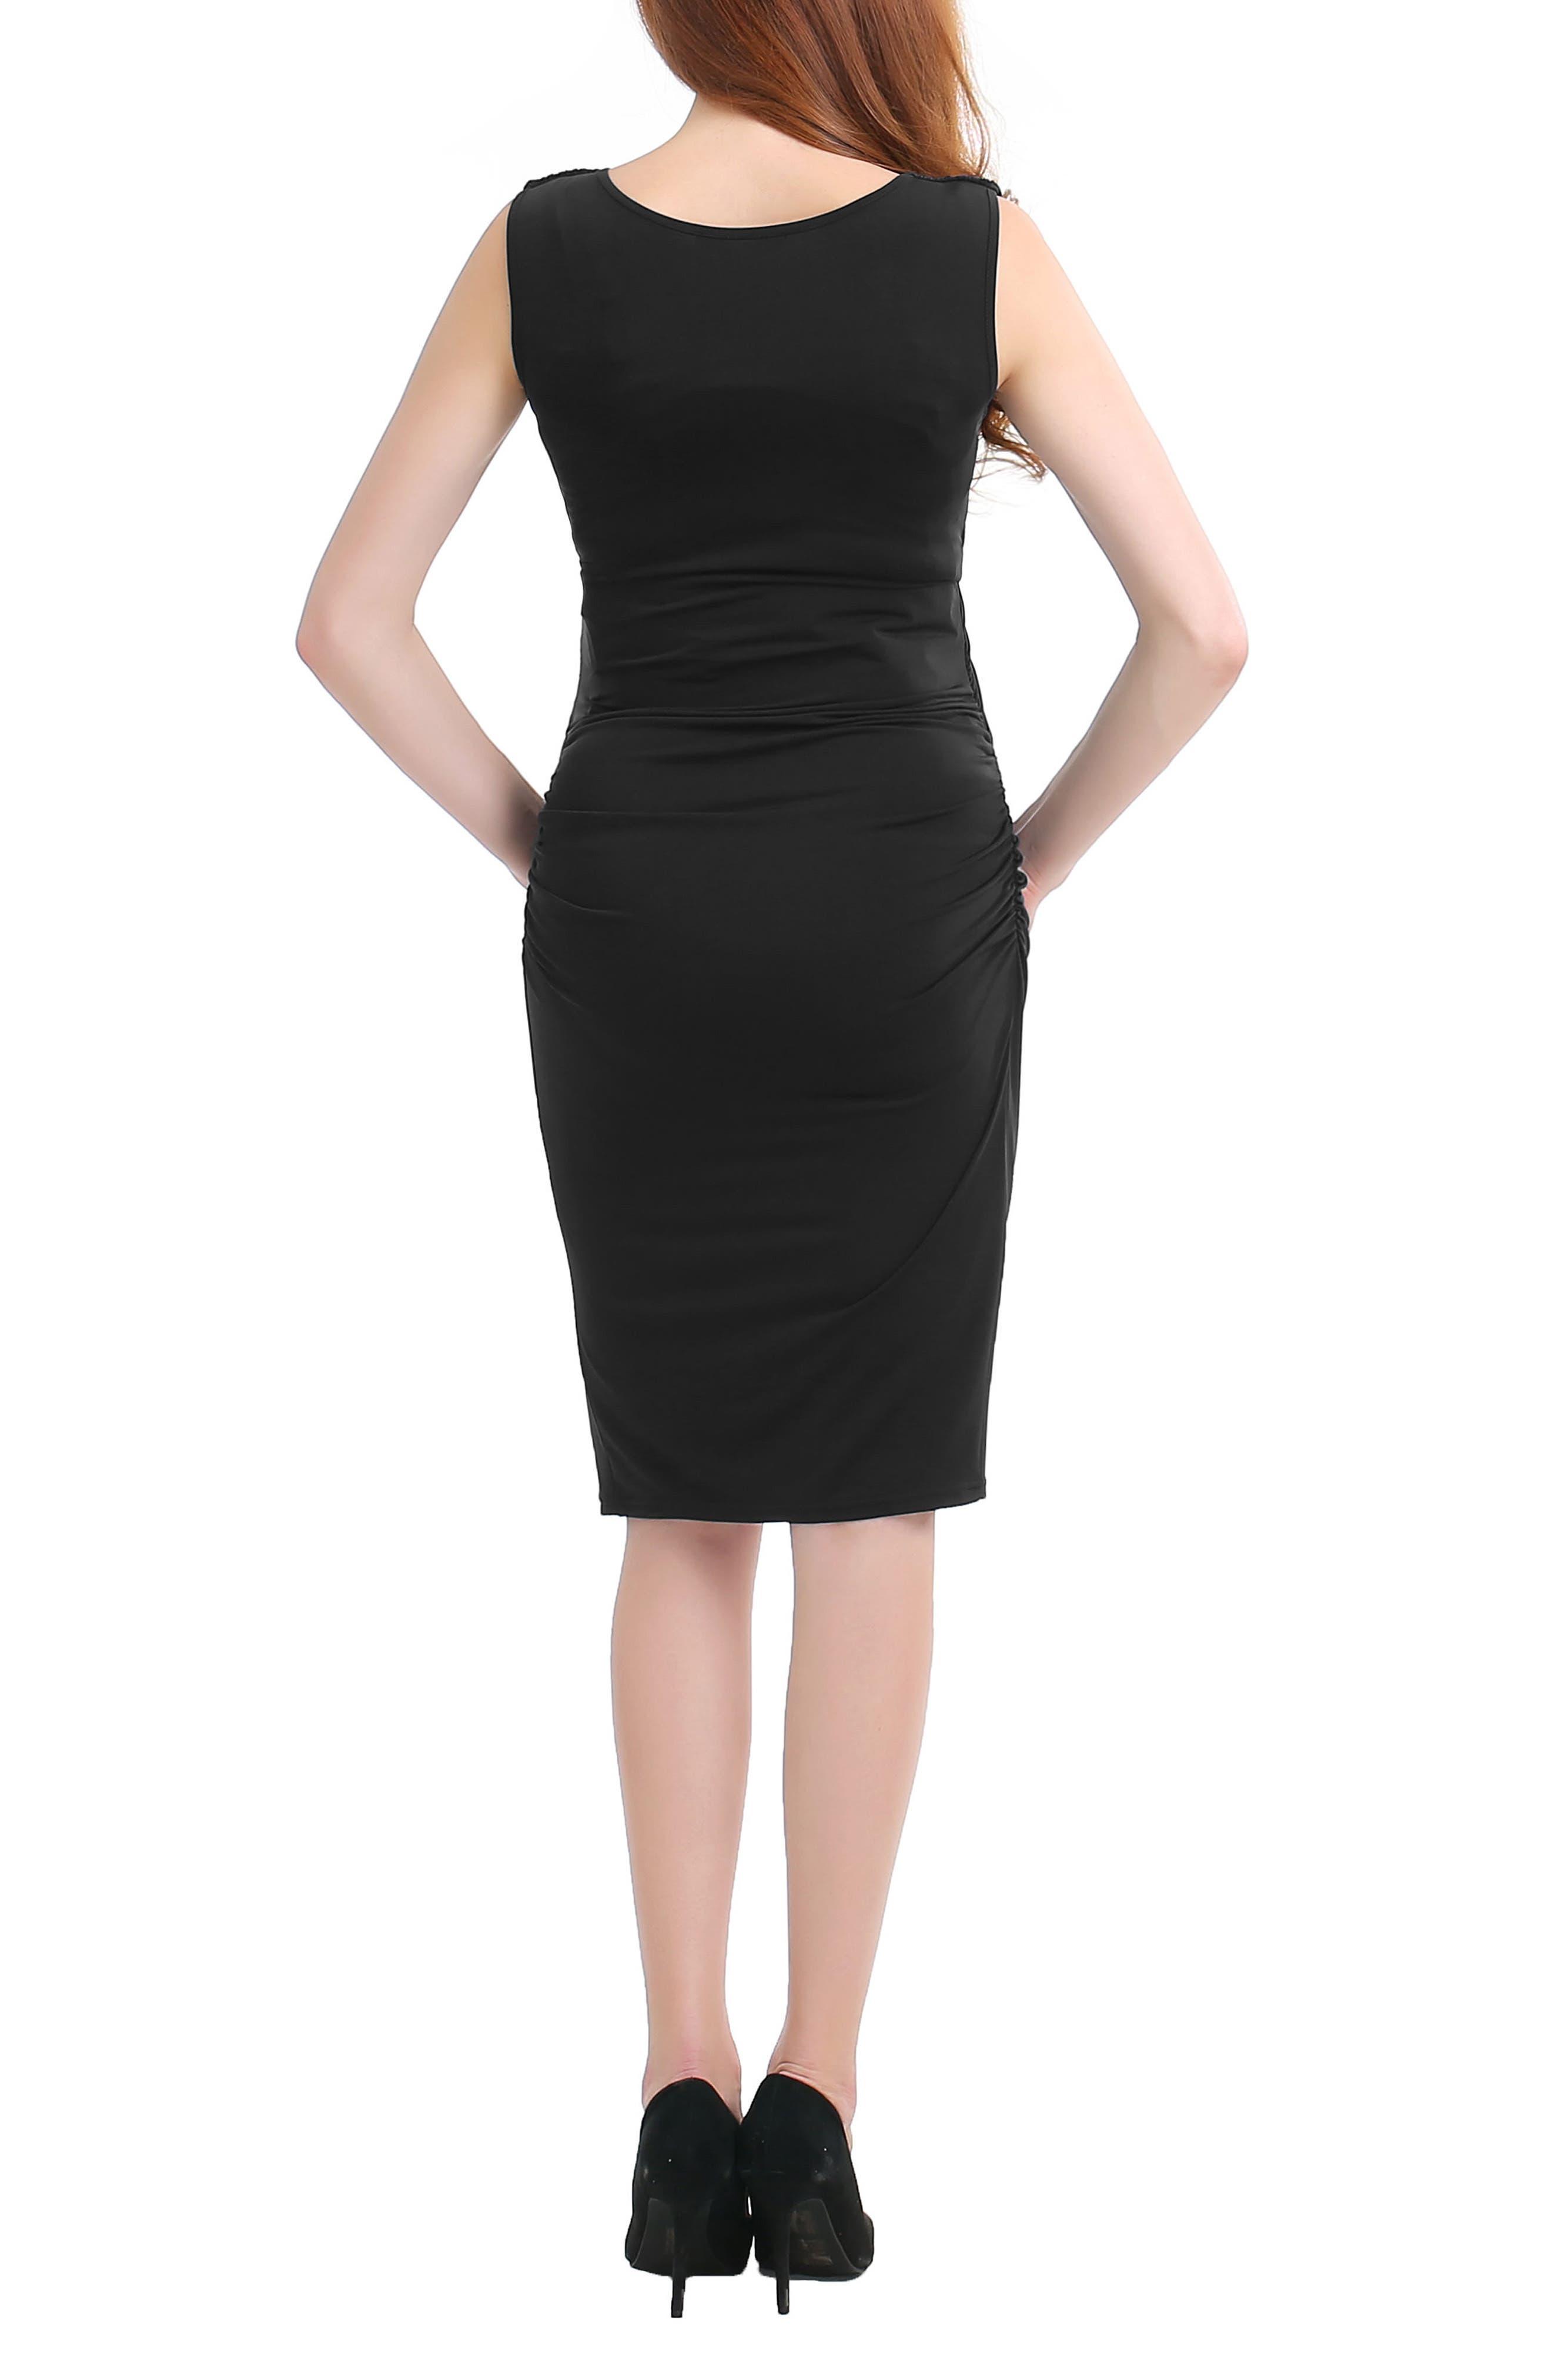 Bonnie Wrap Maternity Dress,                             Alternate thumbnail 2, color,                             Black